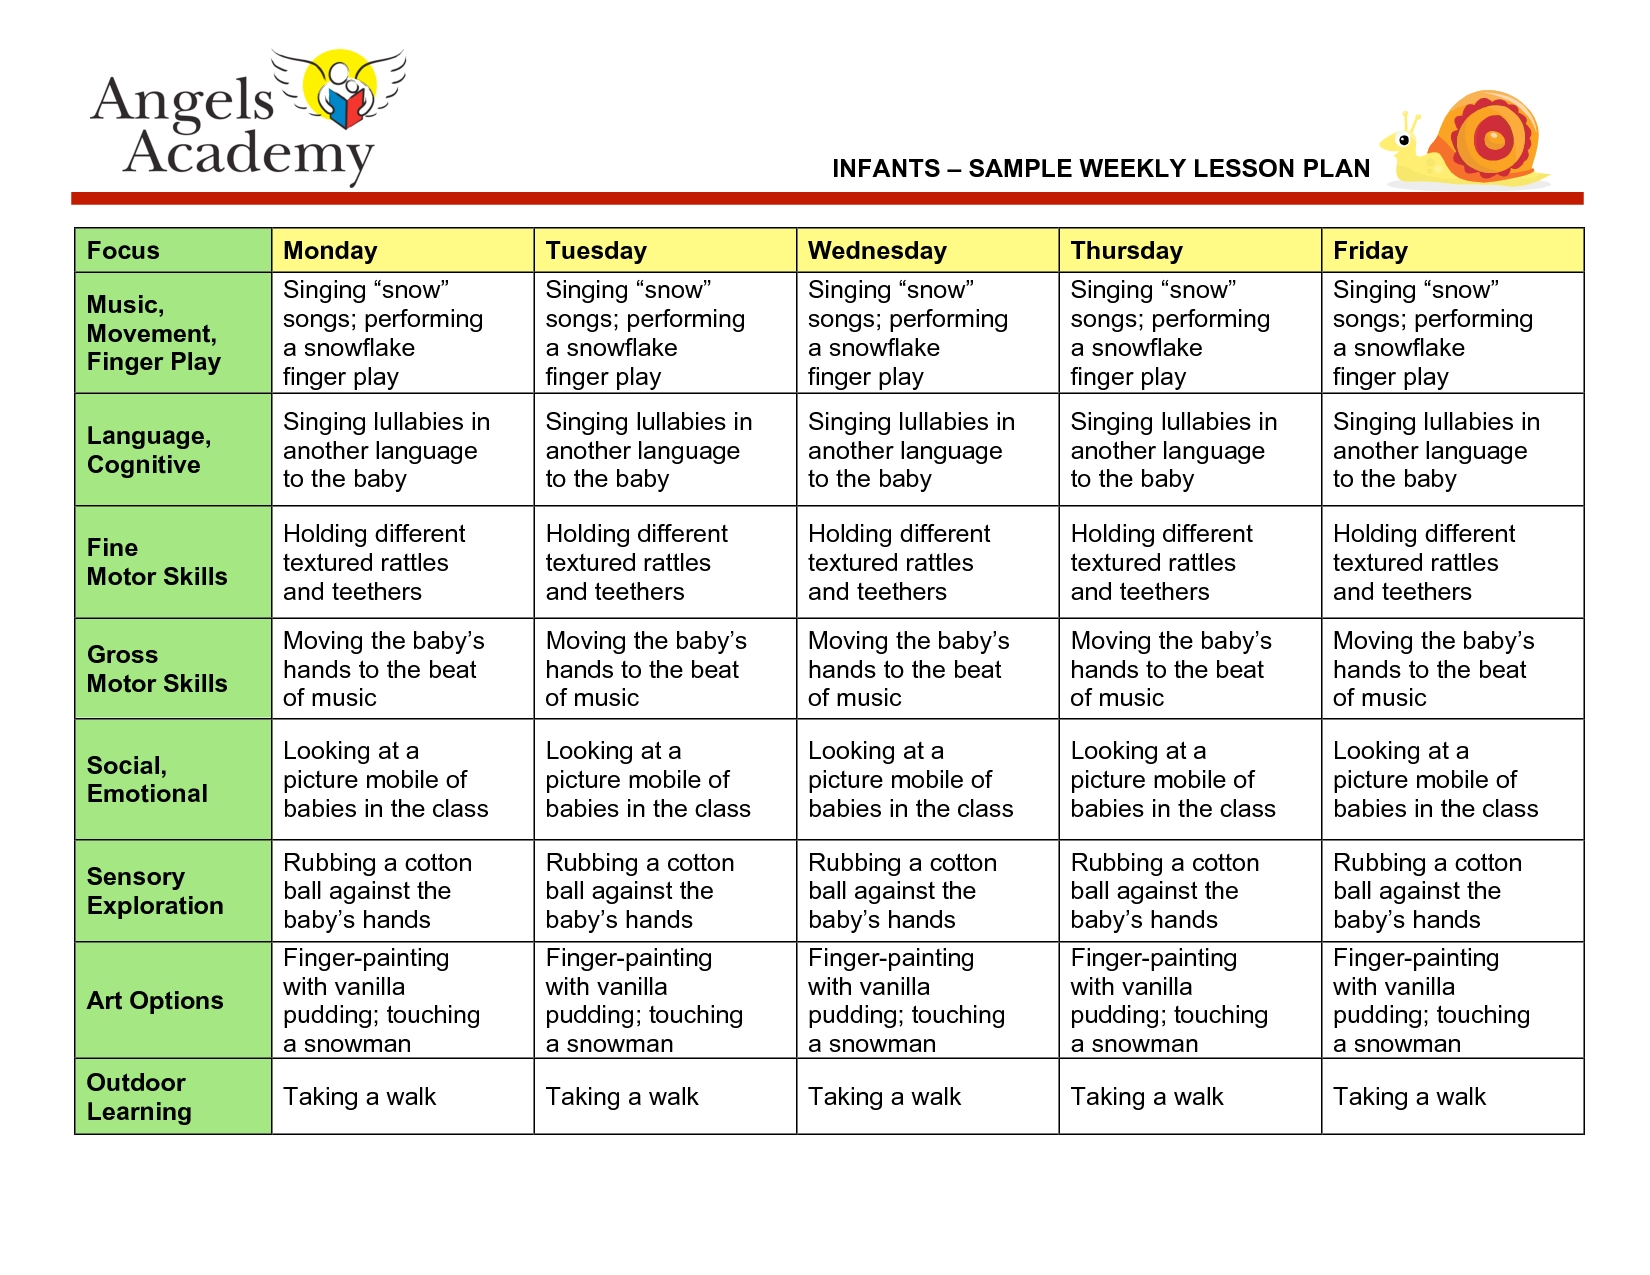 Blank Lesson Plan Template   Infants - Sample Weekly Lesson-Daycare Weekly Lesson Plan Template